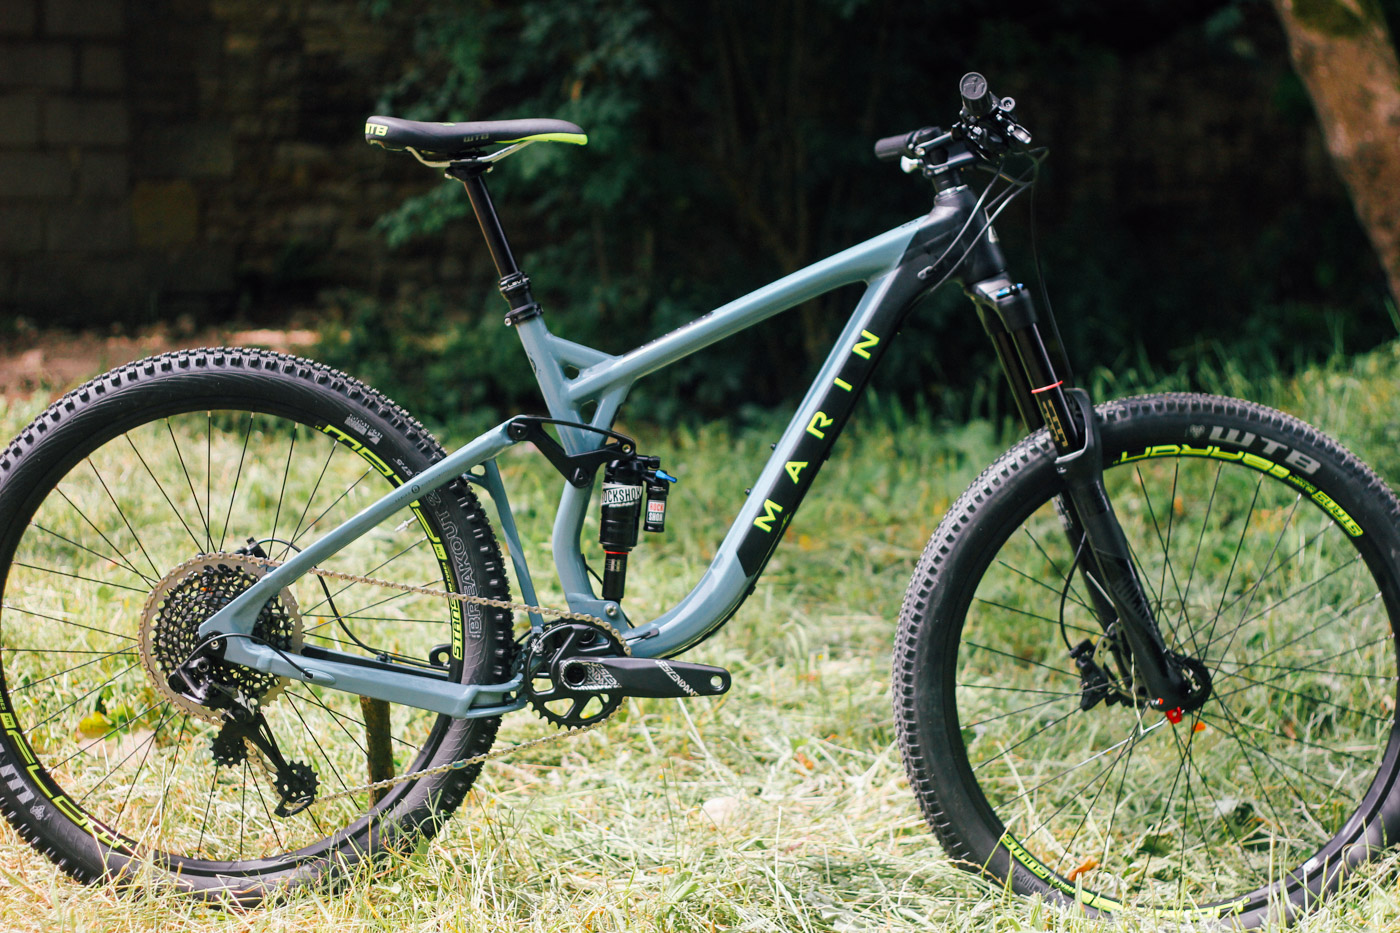 The New 2018 Marin Bikes Range The Best Bits